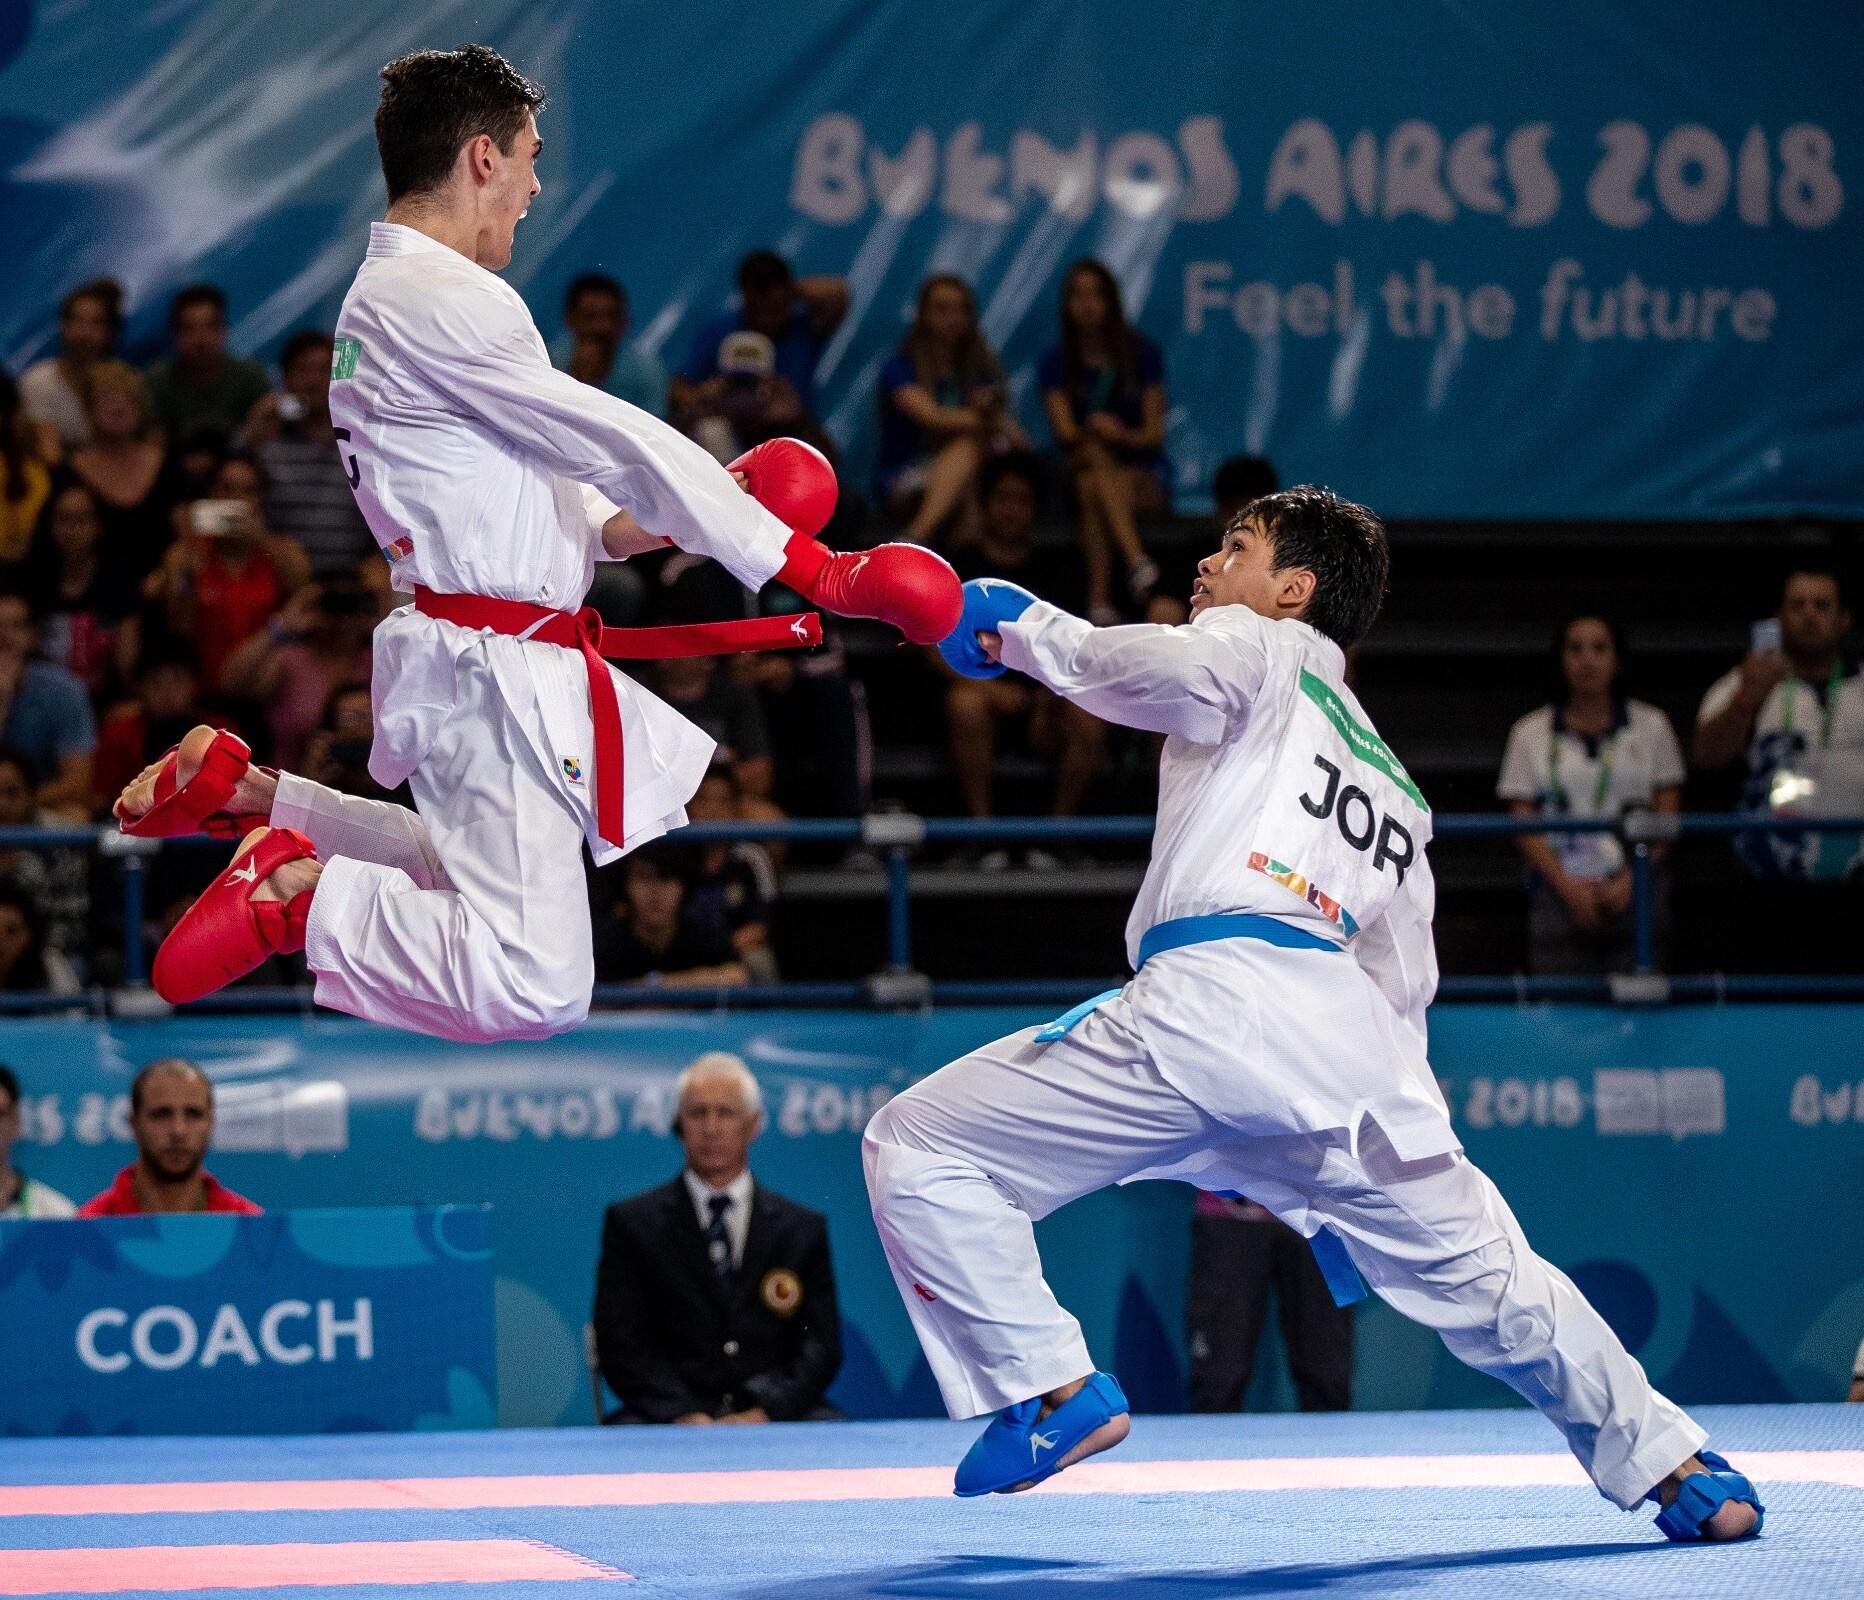 Buenos Aires 2018 - Karate Kumite - Men's -61kg